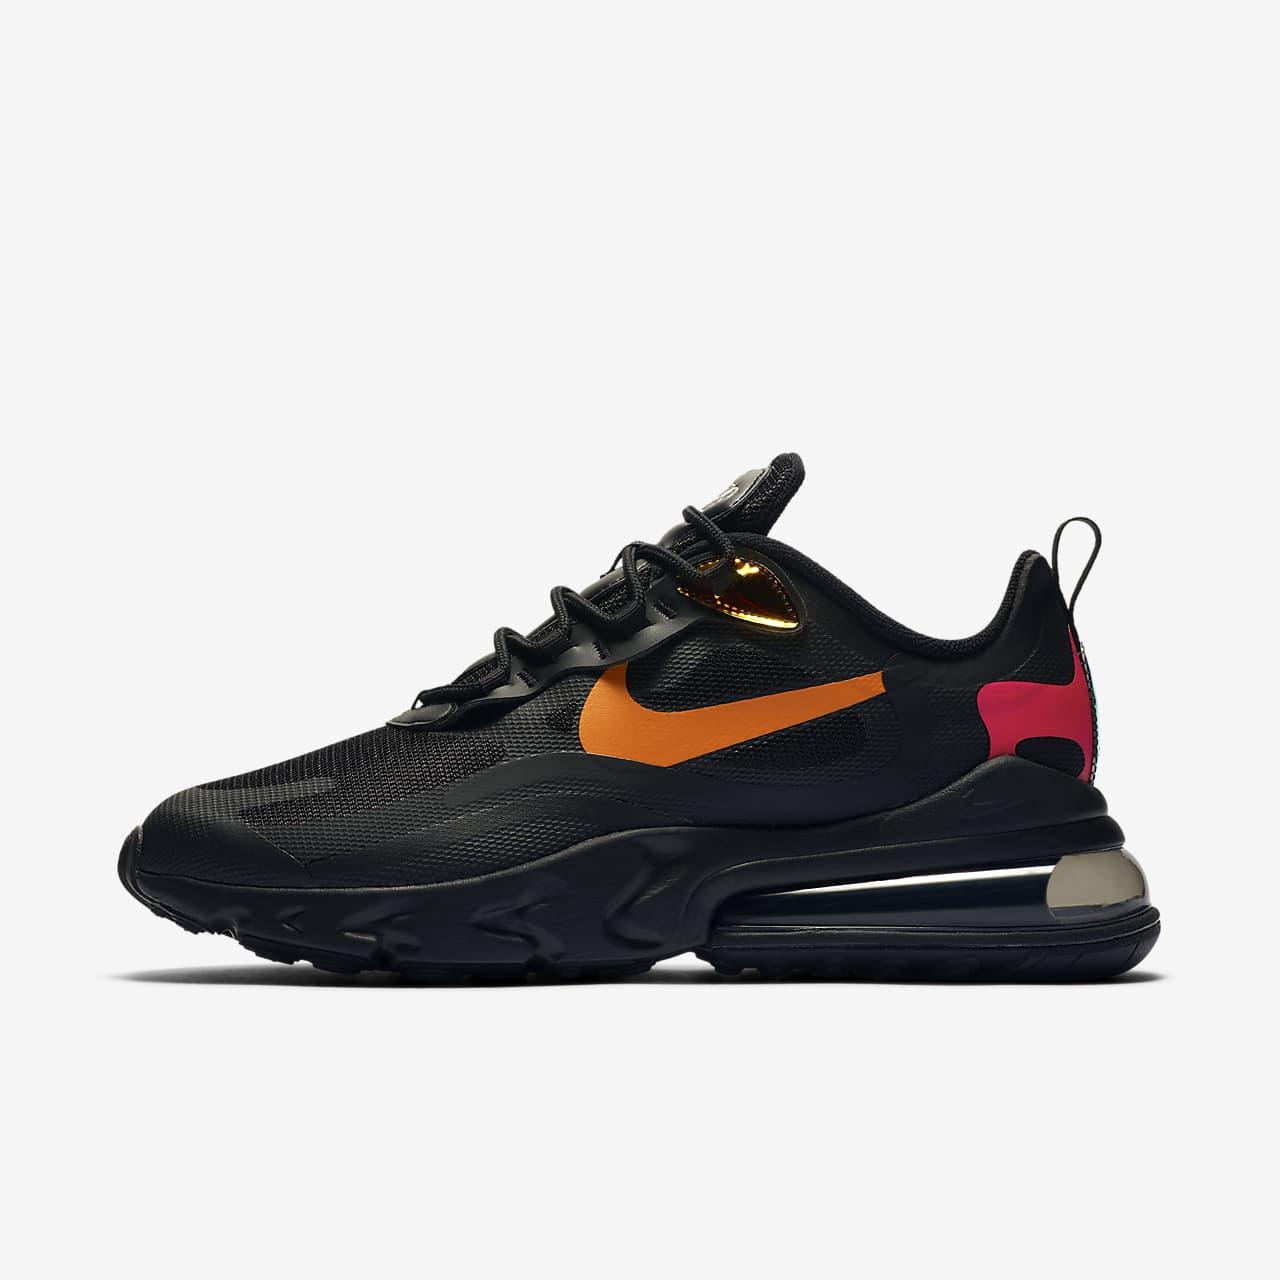 scarpe nike react uomo nere e arancione